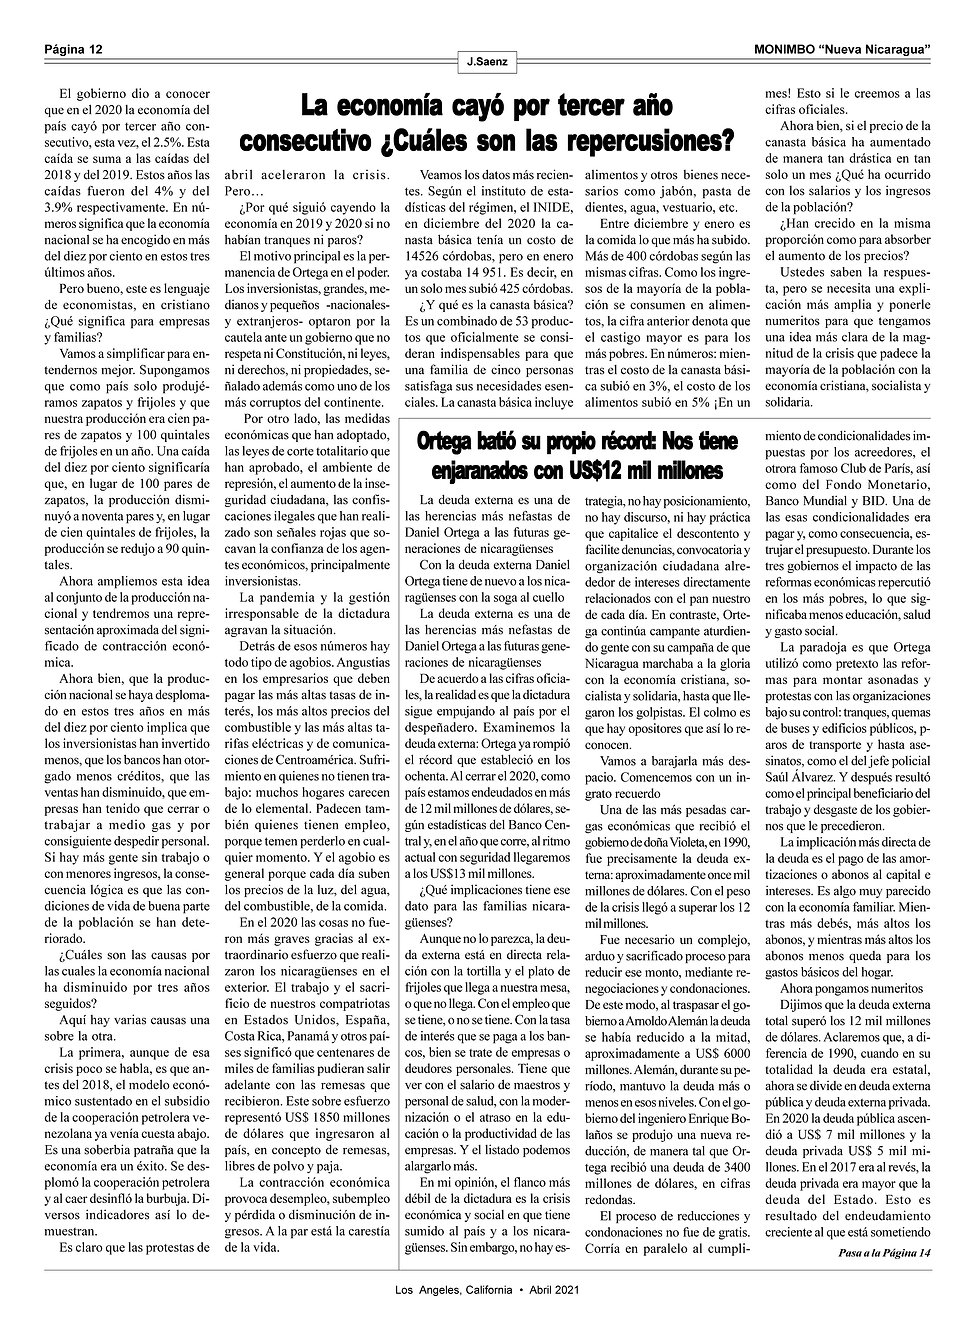 MONIMBO---04-2021---PG12.jpg